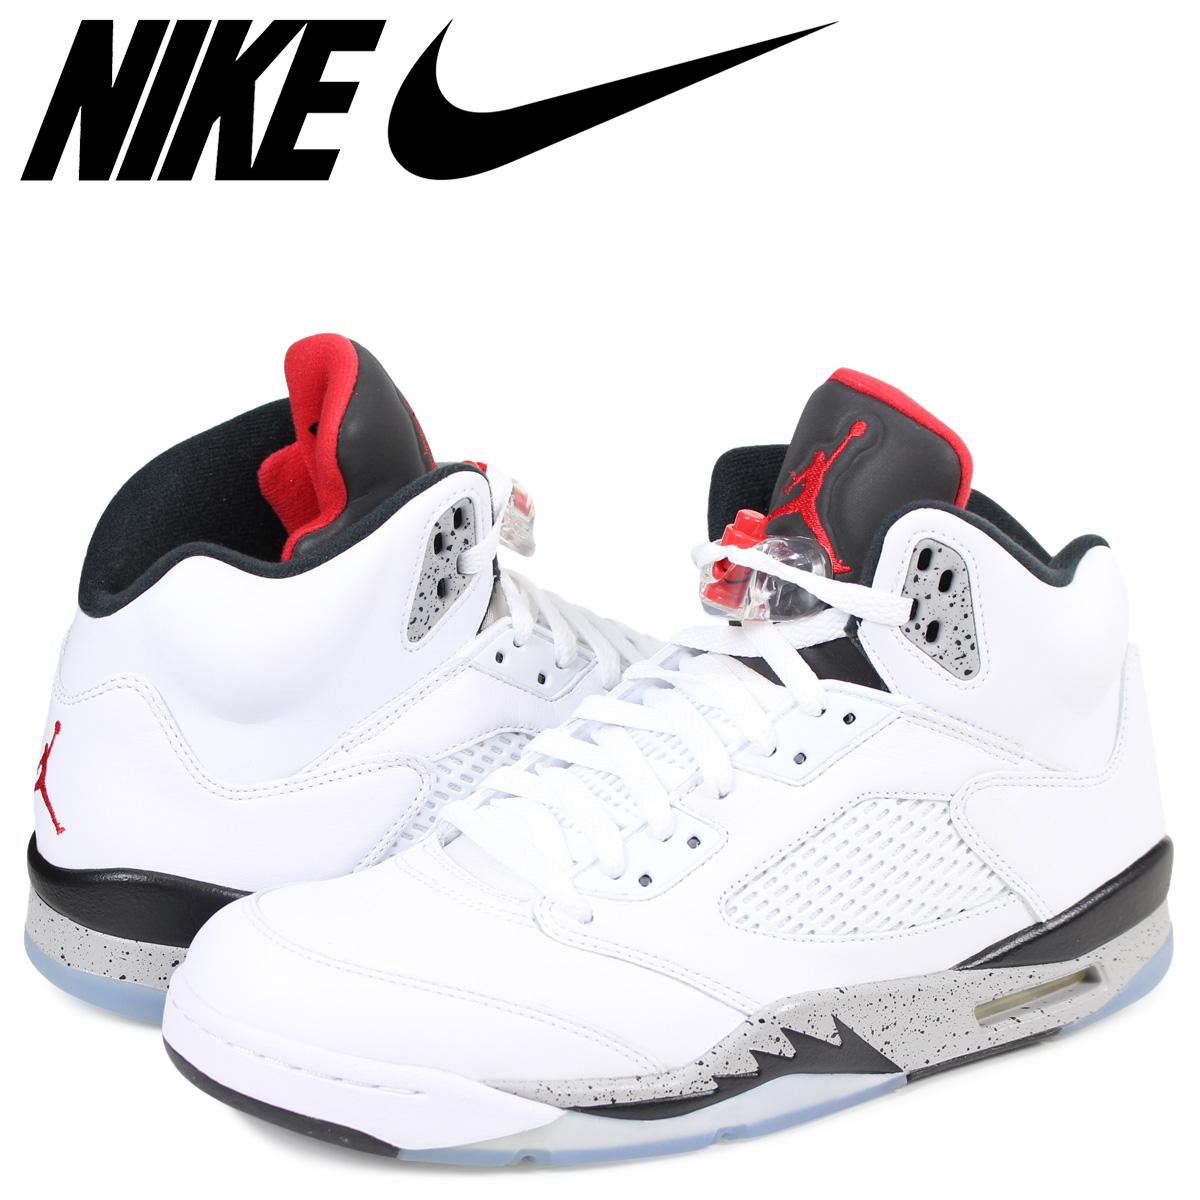 official photos e42df 19021 NIKE AIR JORDAN 5 RETRO WHITE CEMENT Nike Air Jordan 5 nostalgic sneakers  men white 136,027 ...